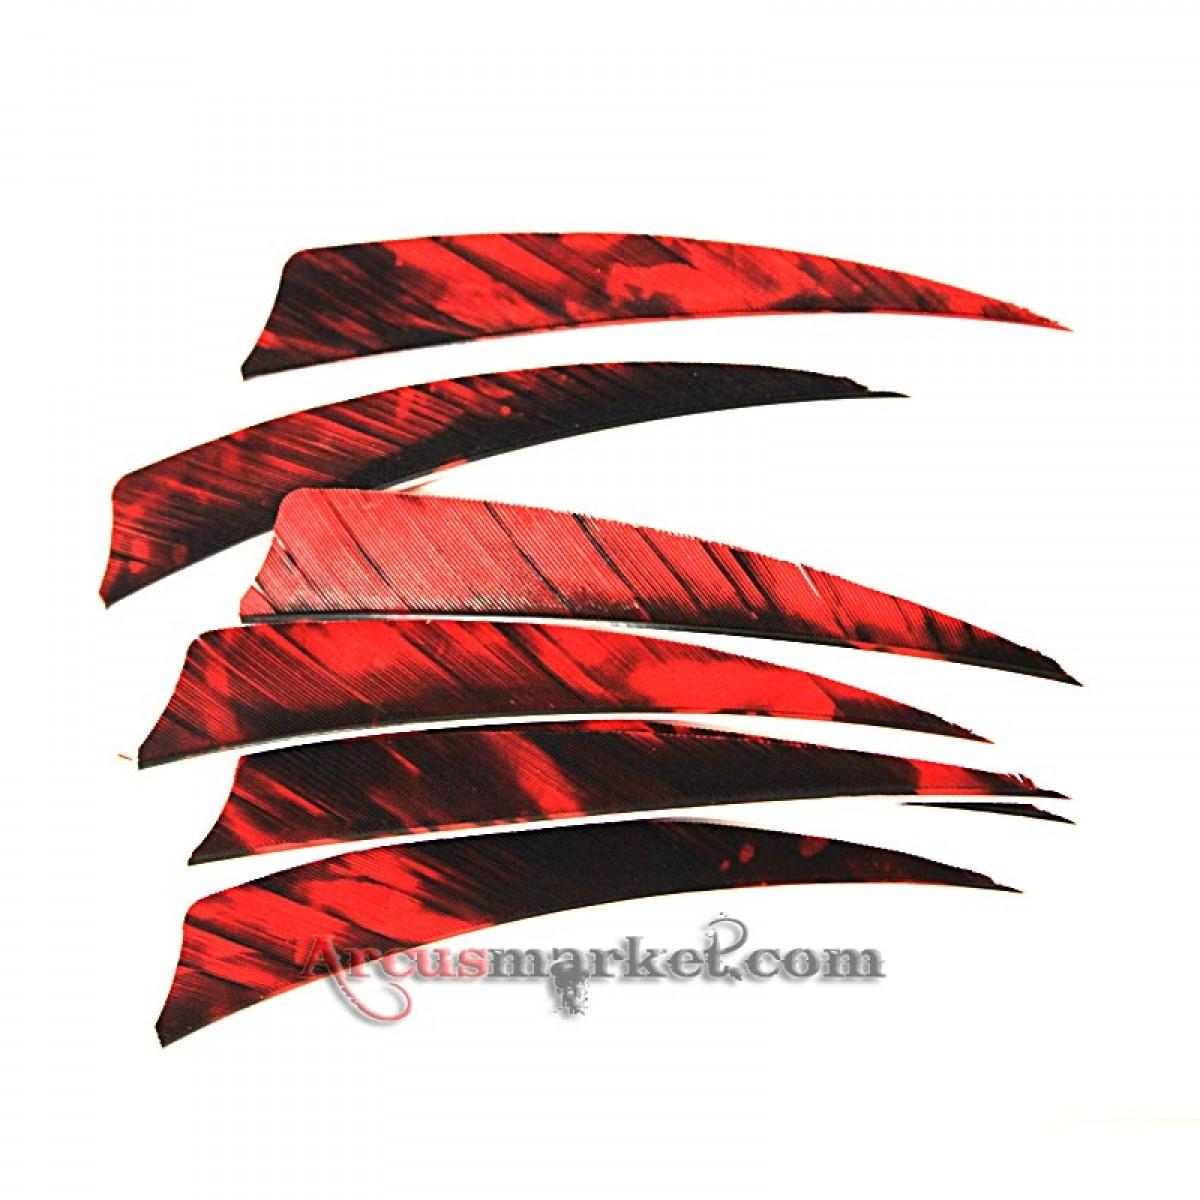 "Перо Gateway Feather 4"" Shield RW Camo"